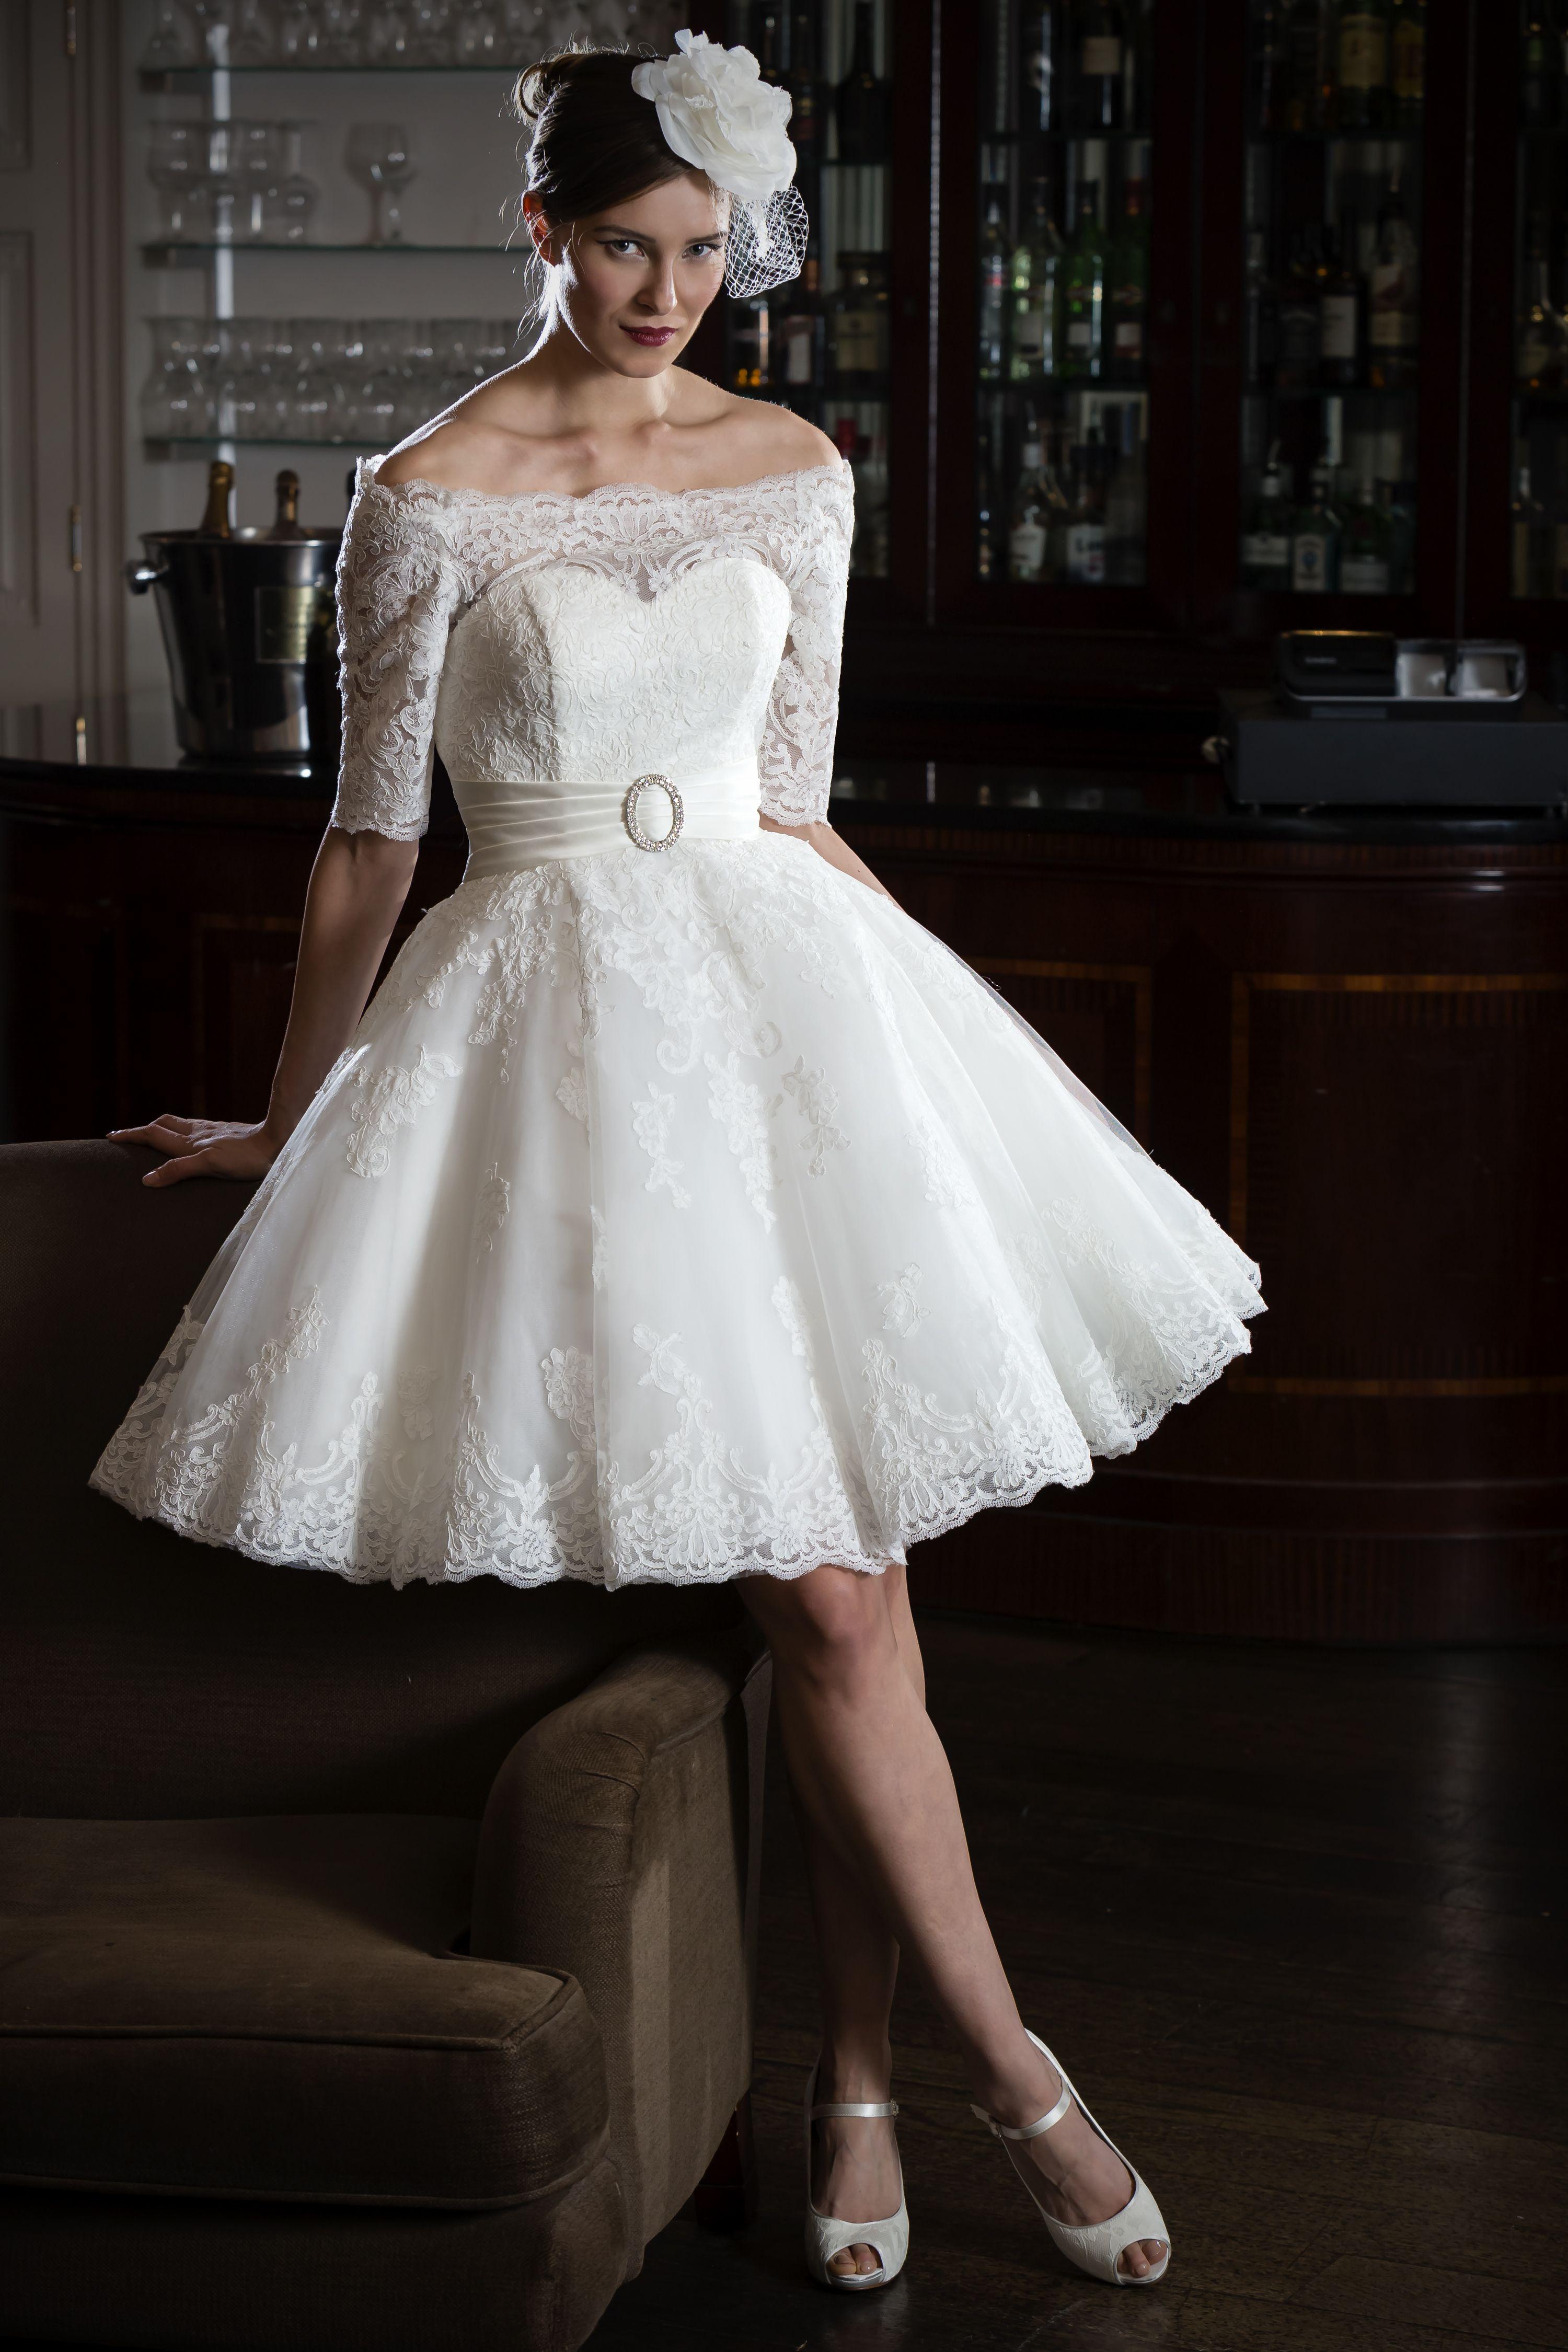 Off the shoulder tea length wedding dress  Nicki Flynn Gia  Toni bridal  Pinterest  Lace bodice Tea length